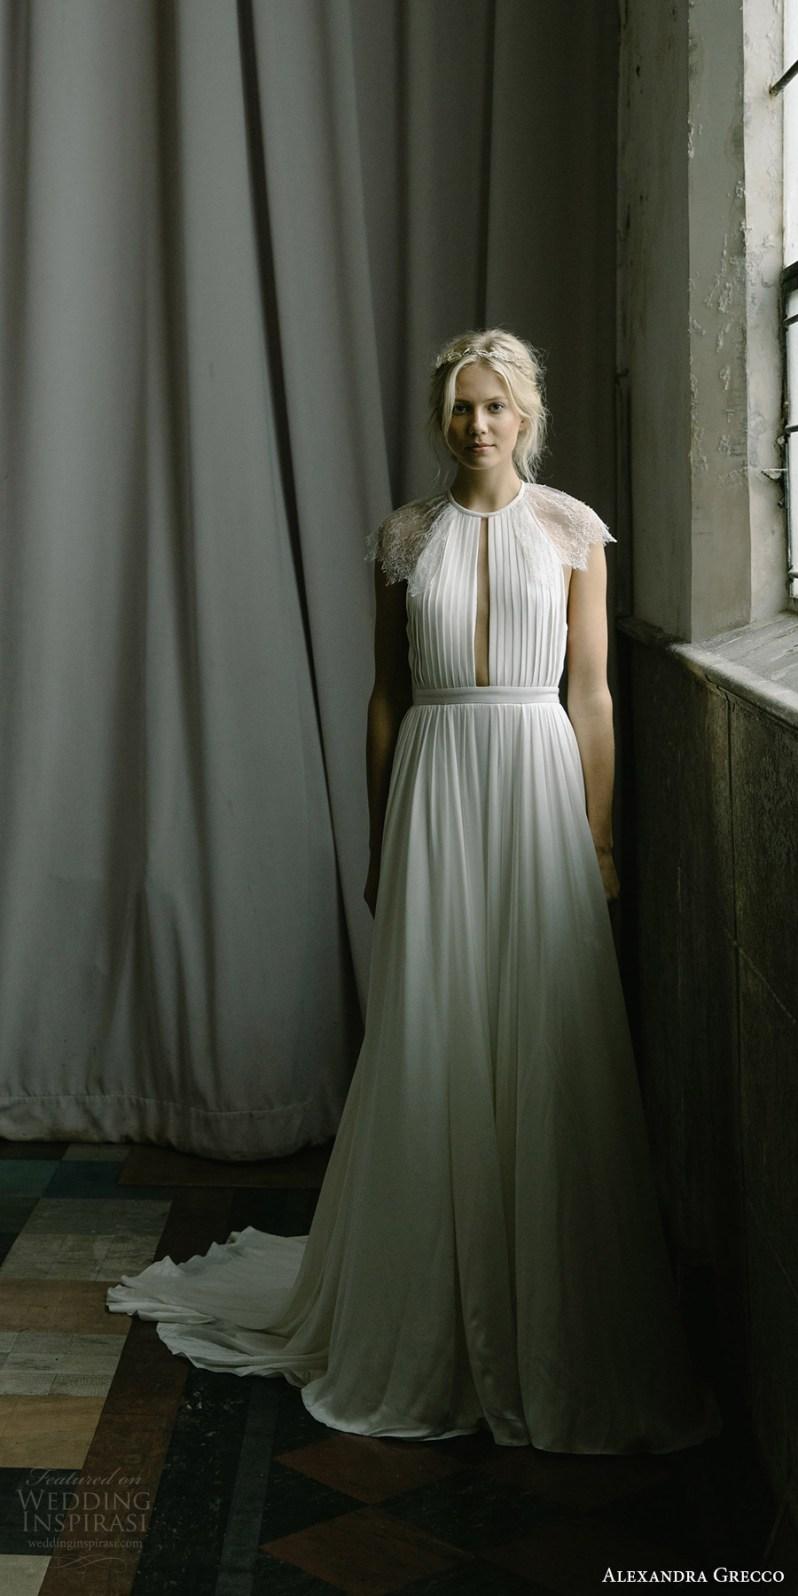 Things I wish I knew before I bought my wedding dress .... @Sheer Ever After Wedding Blog www.sheereverafter.wordpress.com